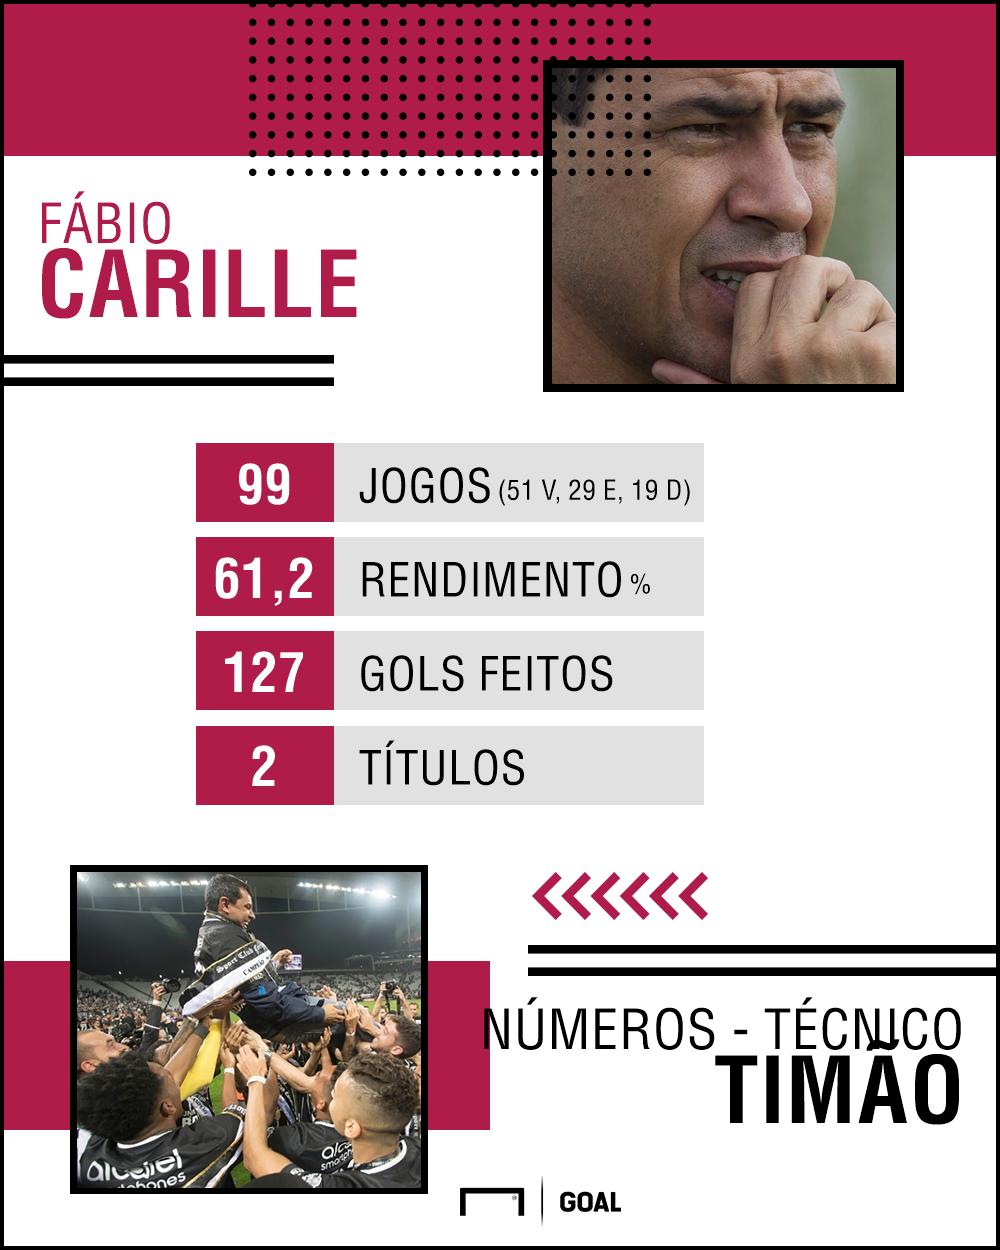 Fábio Carille PS - Corinthians - 24/03/2018